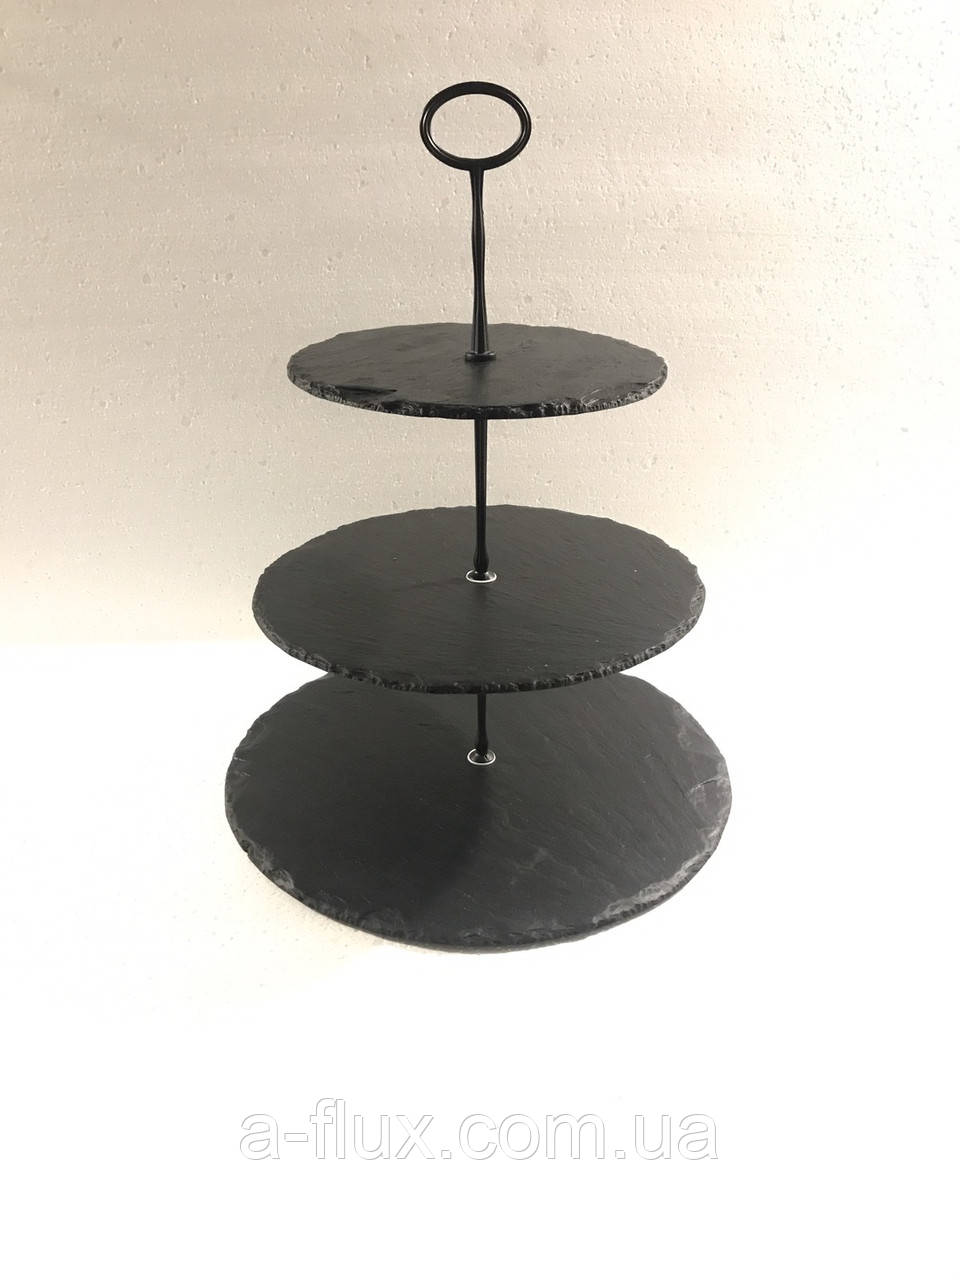 Пирамида 3-хярусная круглая (19,5х25х30см) сланец, черная фурнитура  Н37см  Украина 002382